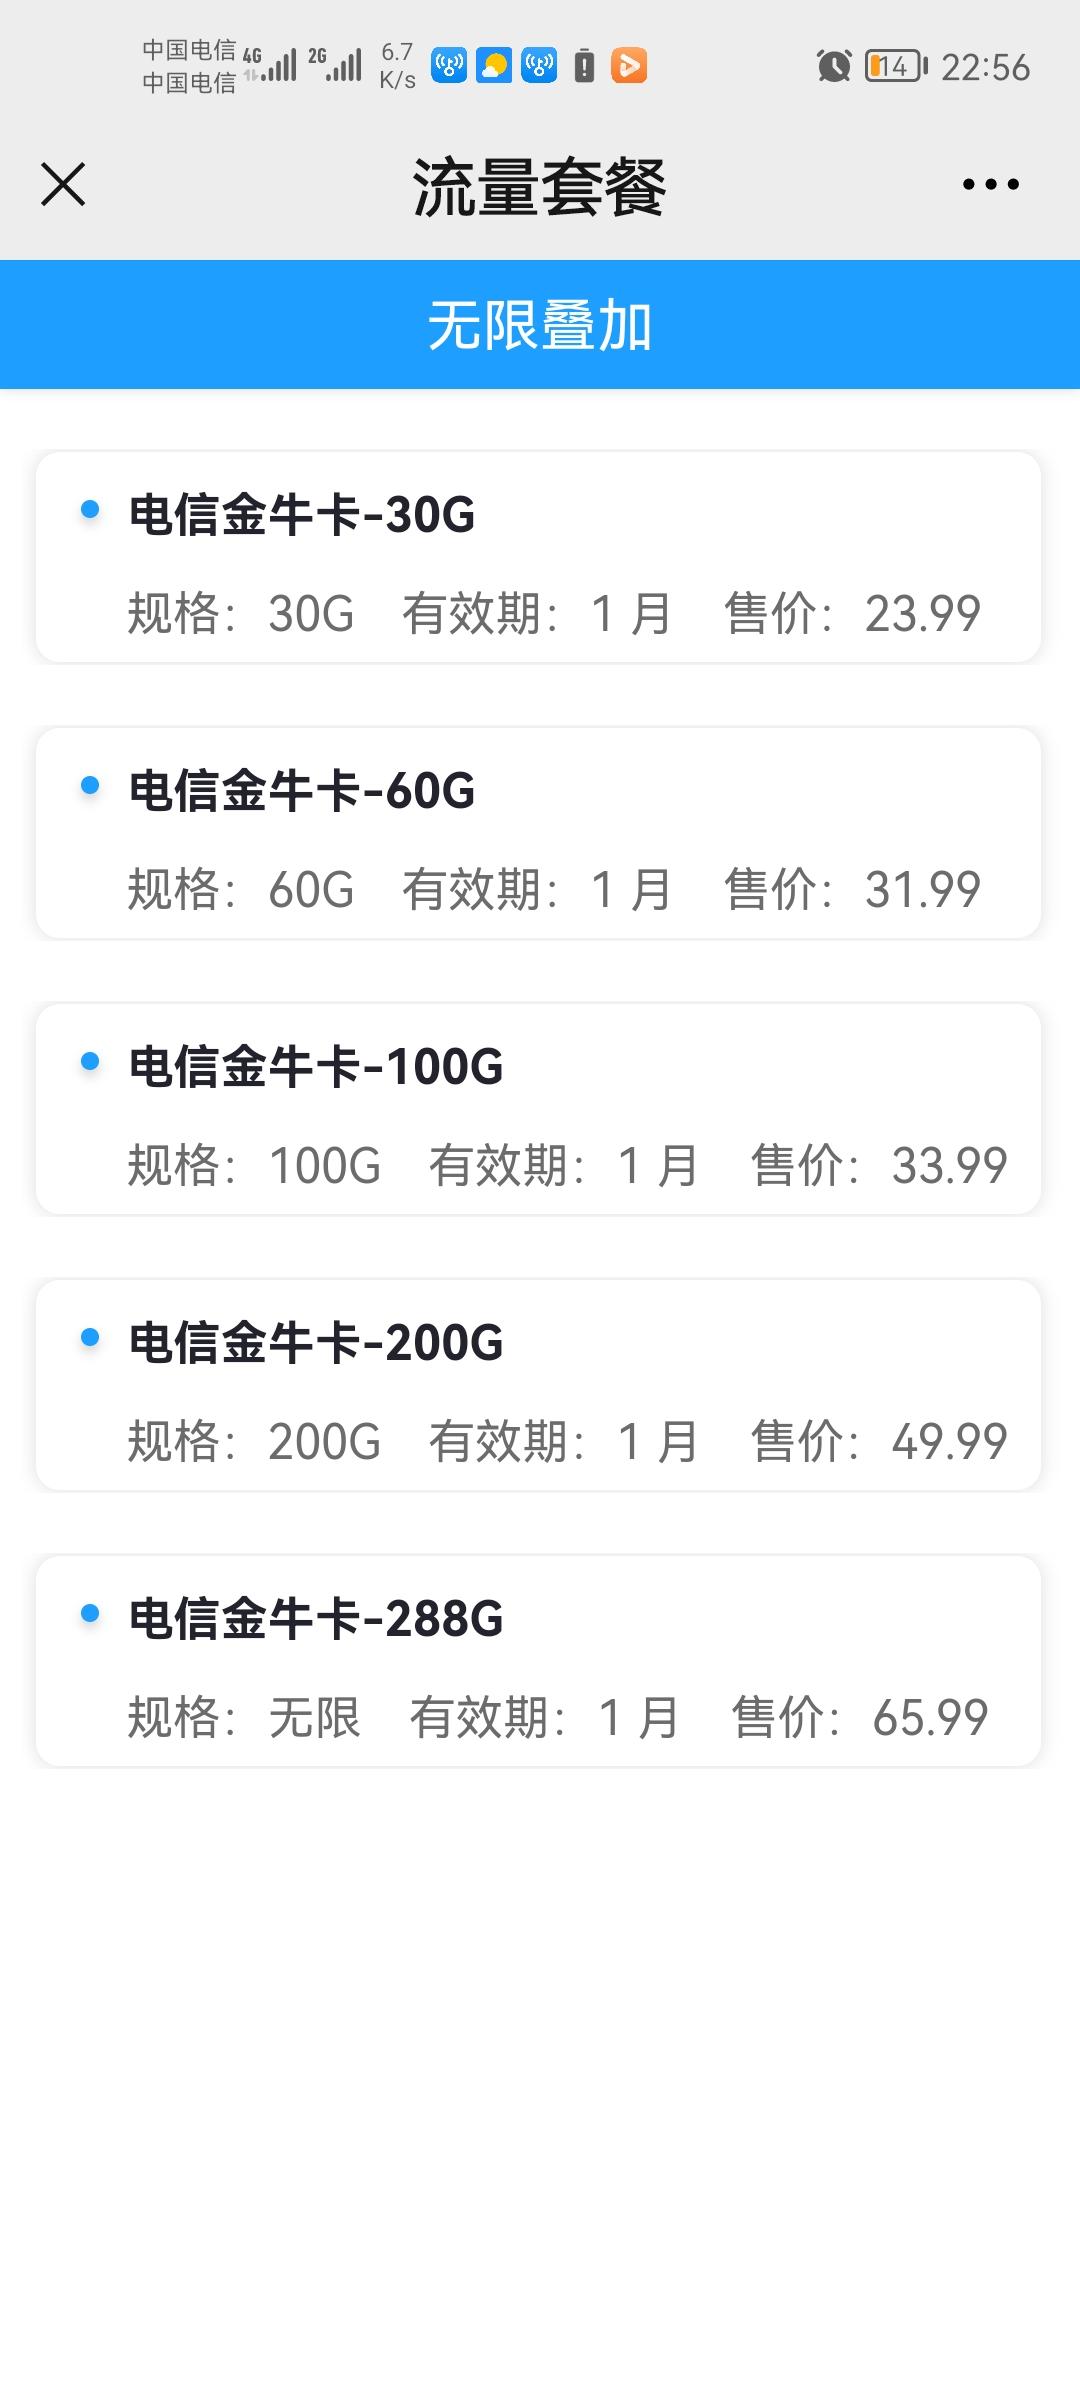 Screenshot_20210803_225618_com.tencent.mm.jpg